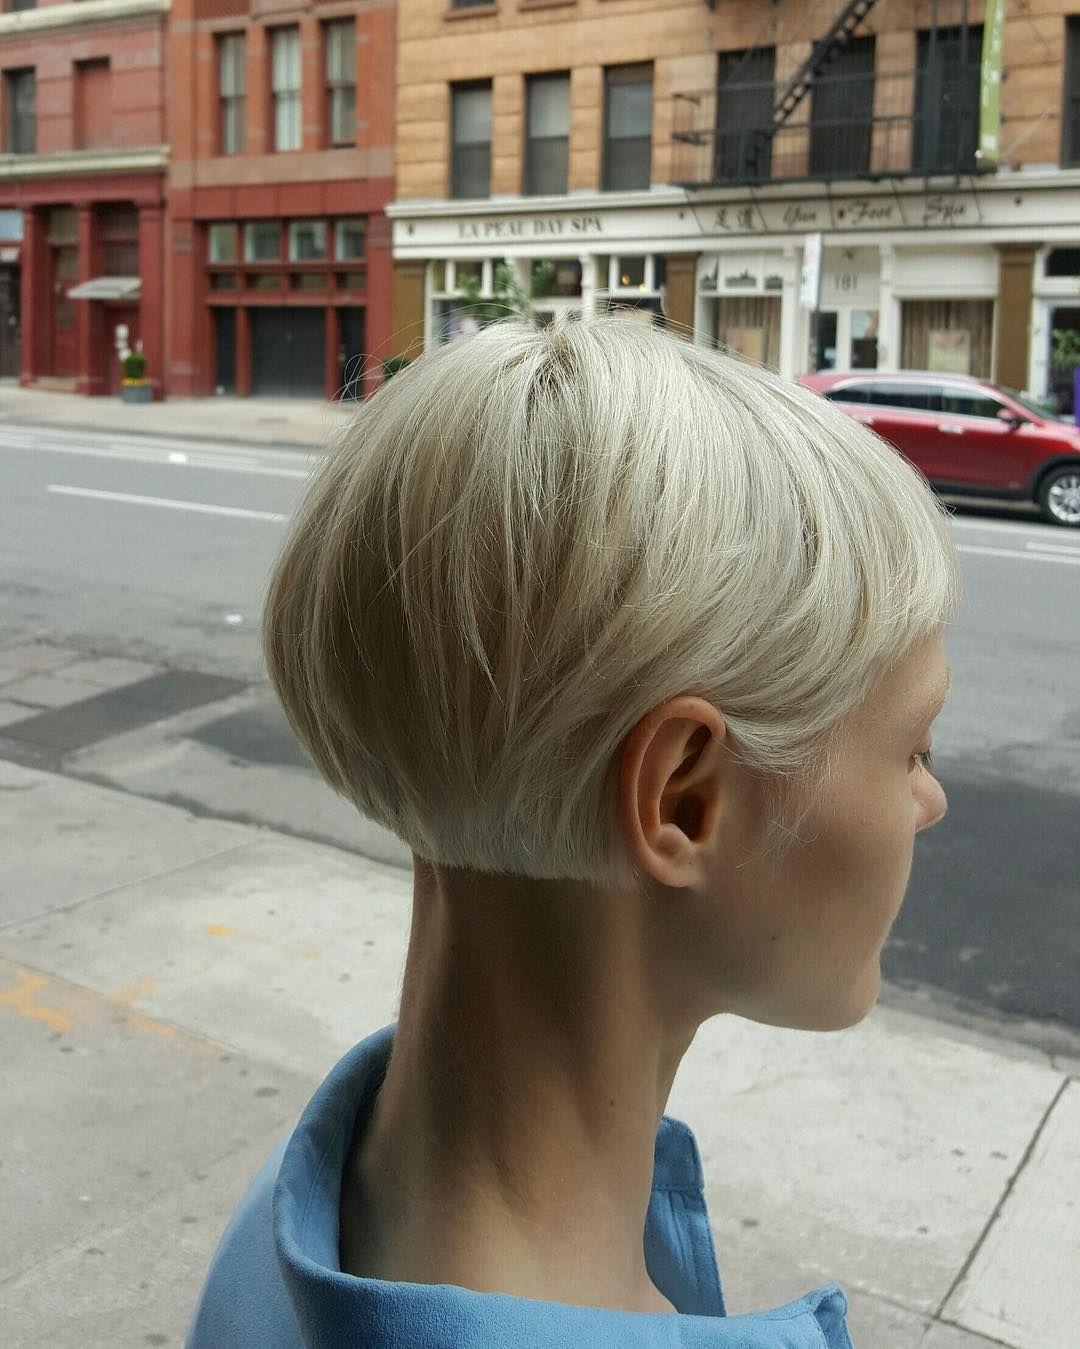 loiro / cabelo curto / cabelo chanel